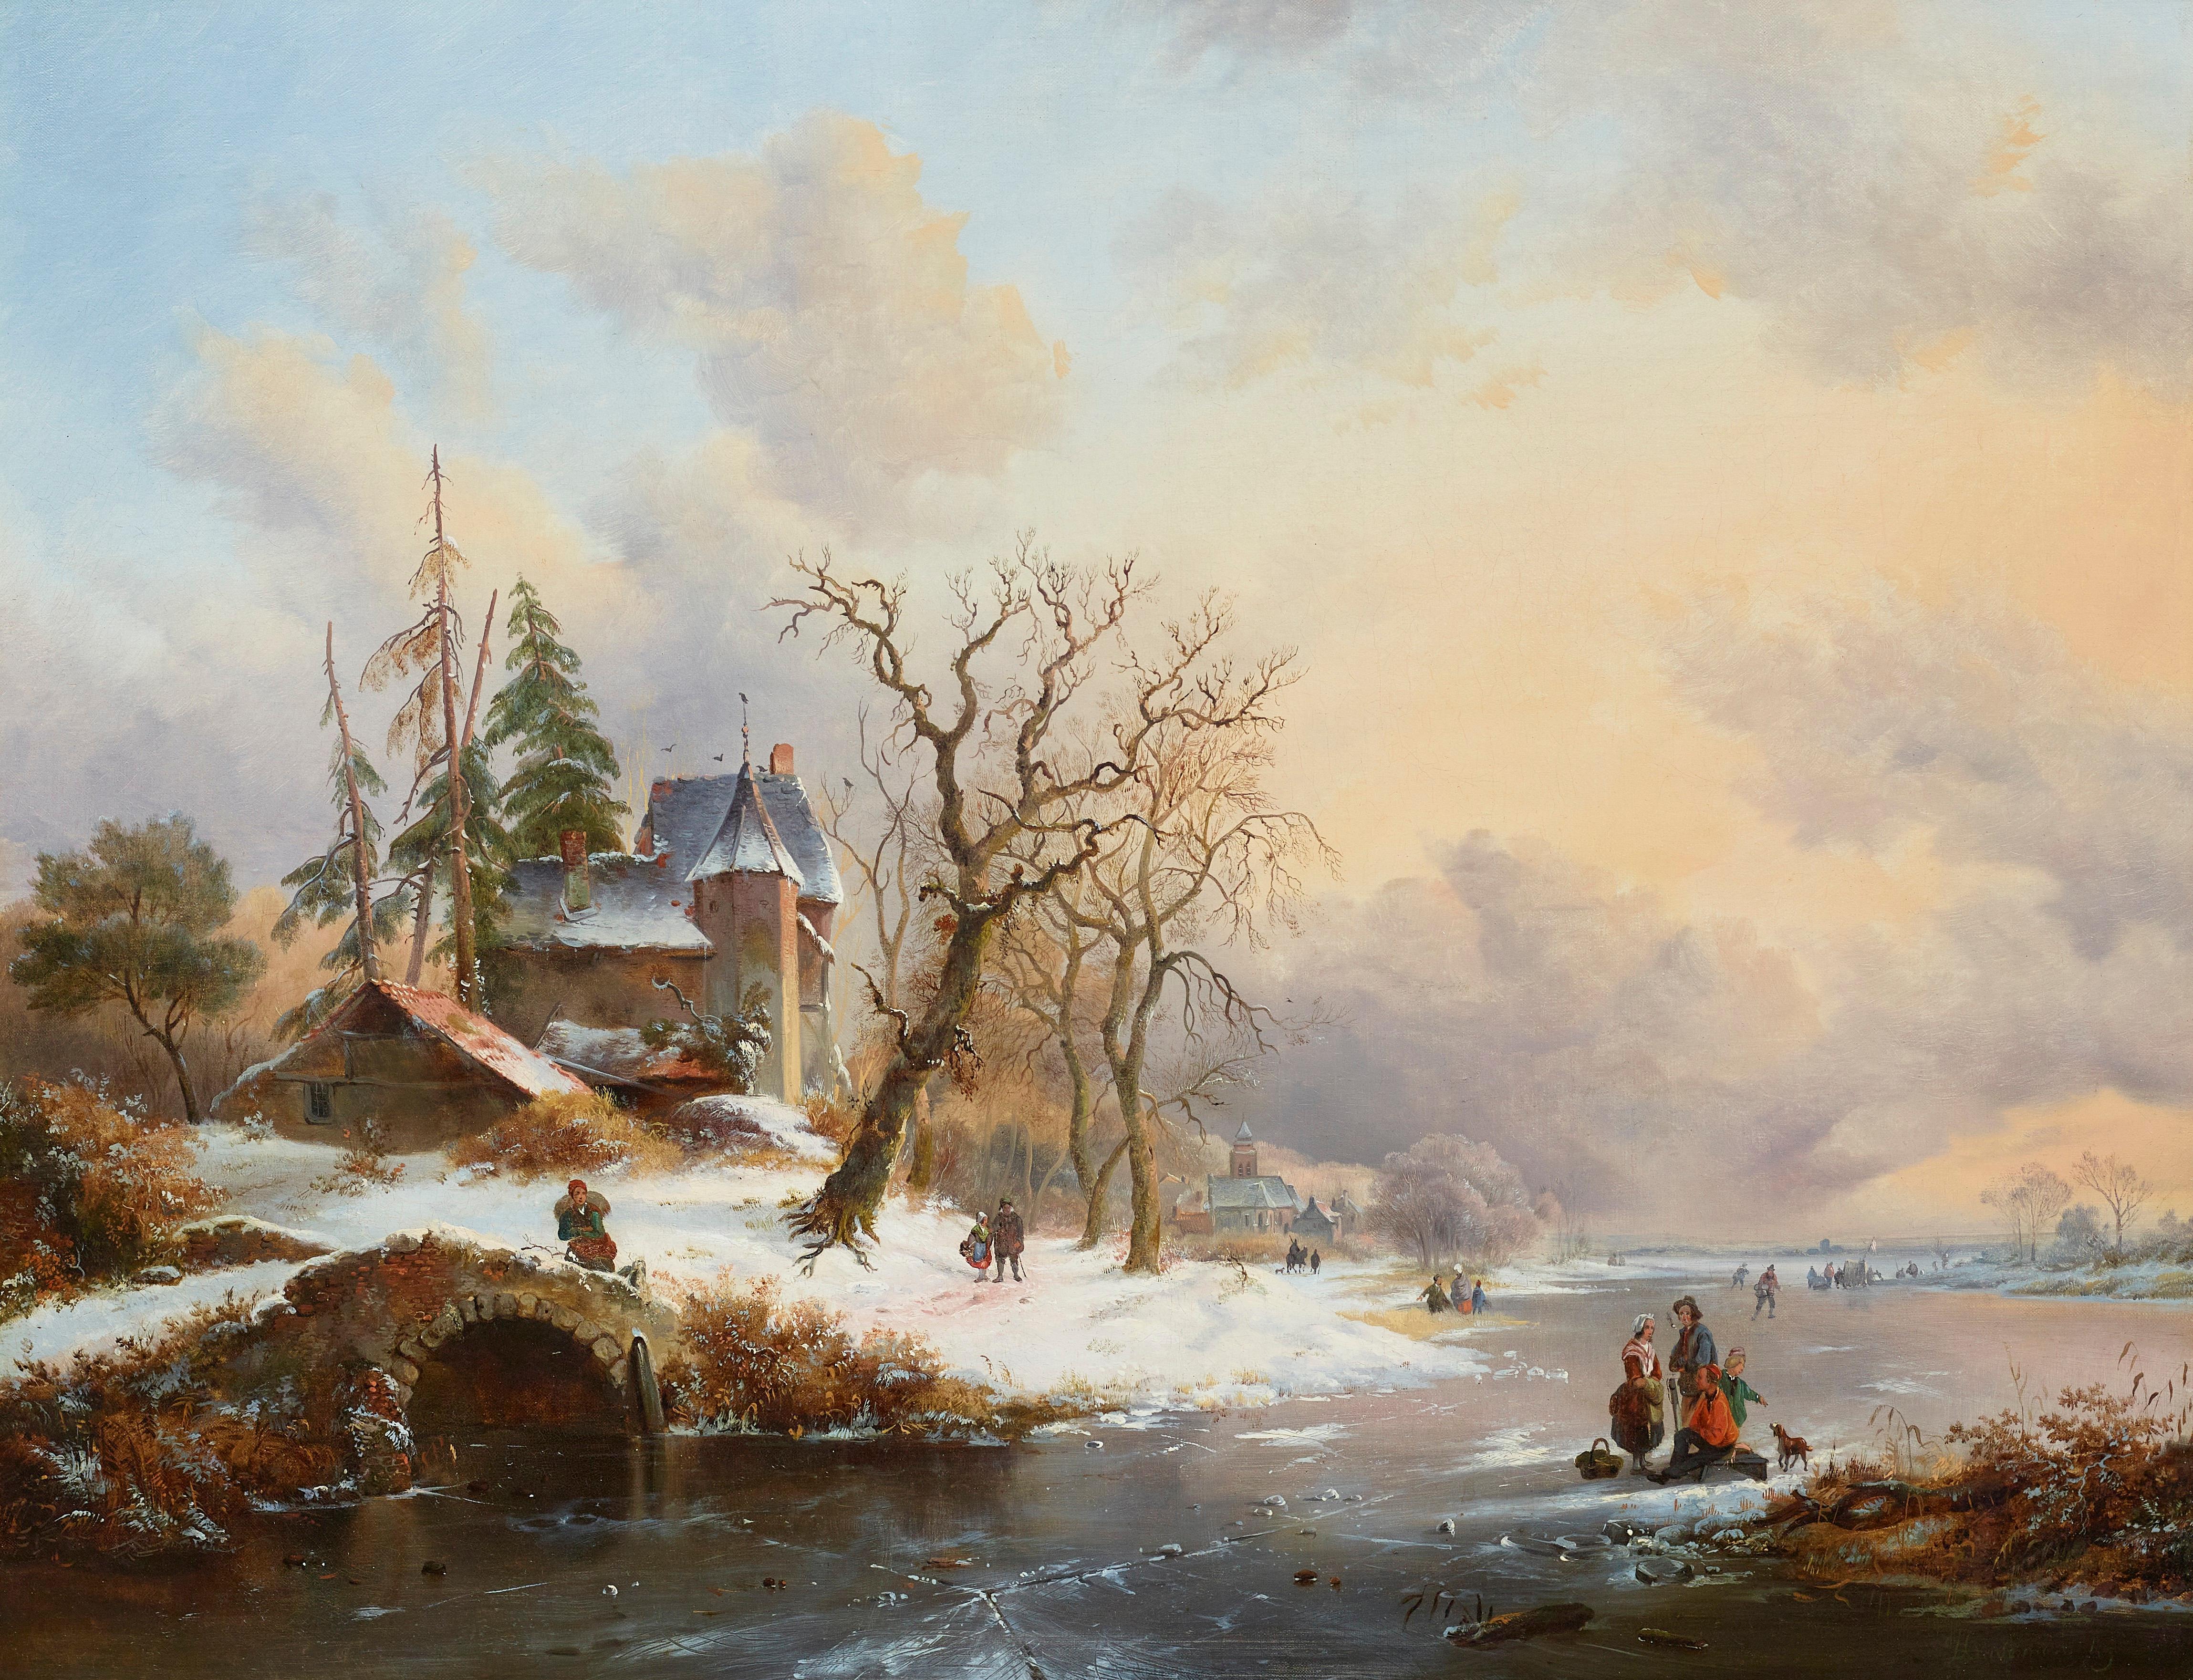 19th Century Winter Skating Scene 'Snowy Landscape' Frederik Marinus Kruseman